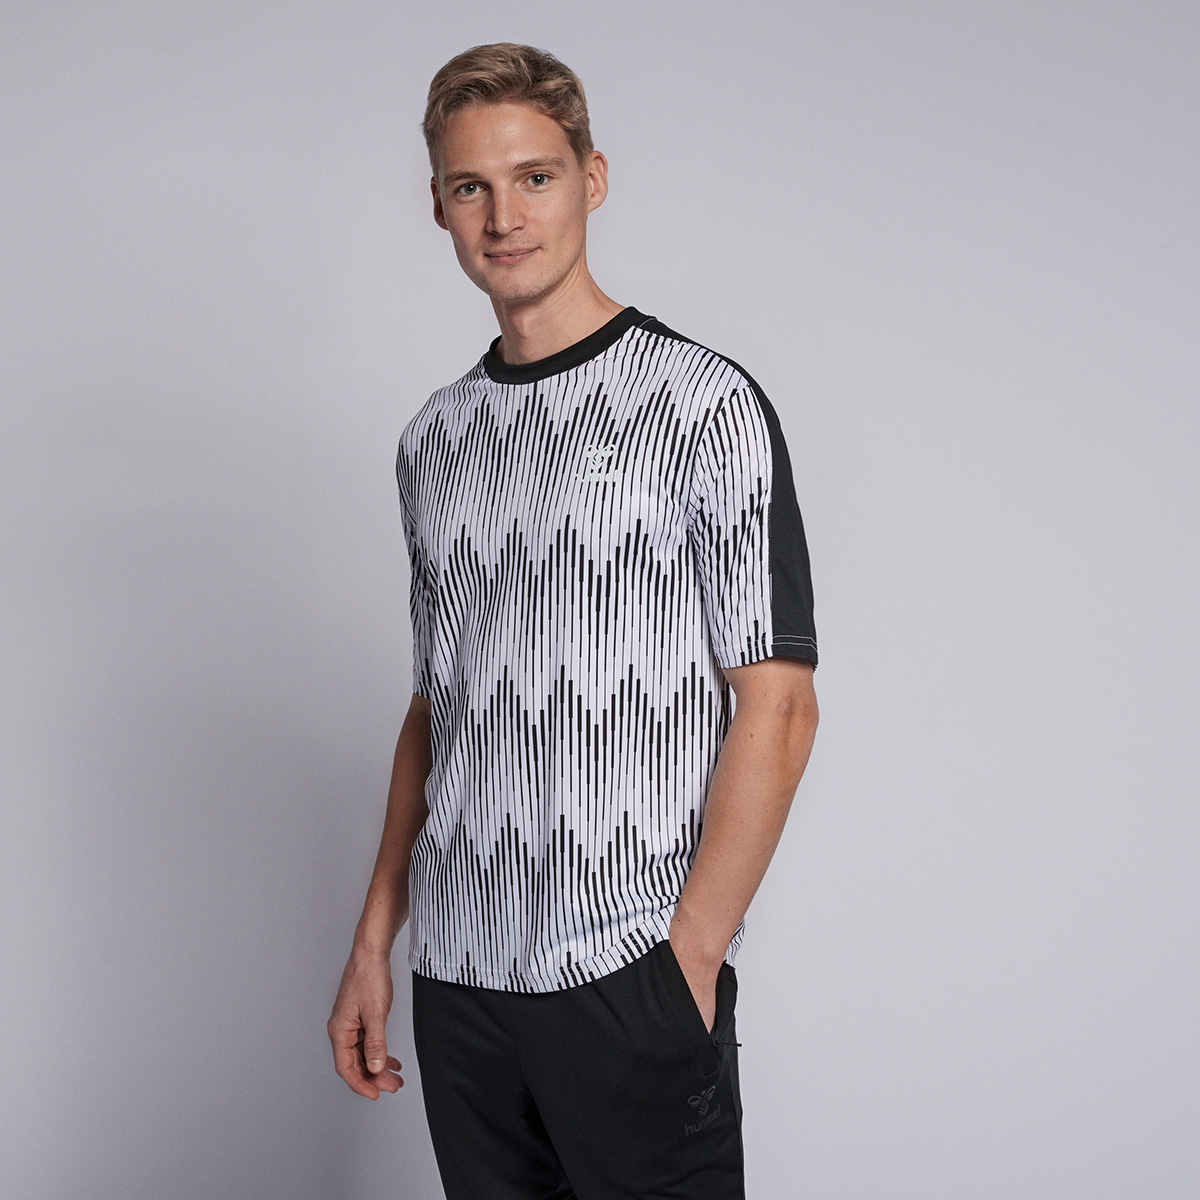 Hummel Blaze t-shirt, white, medium